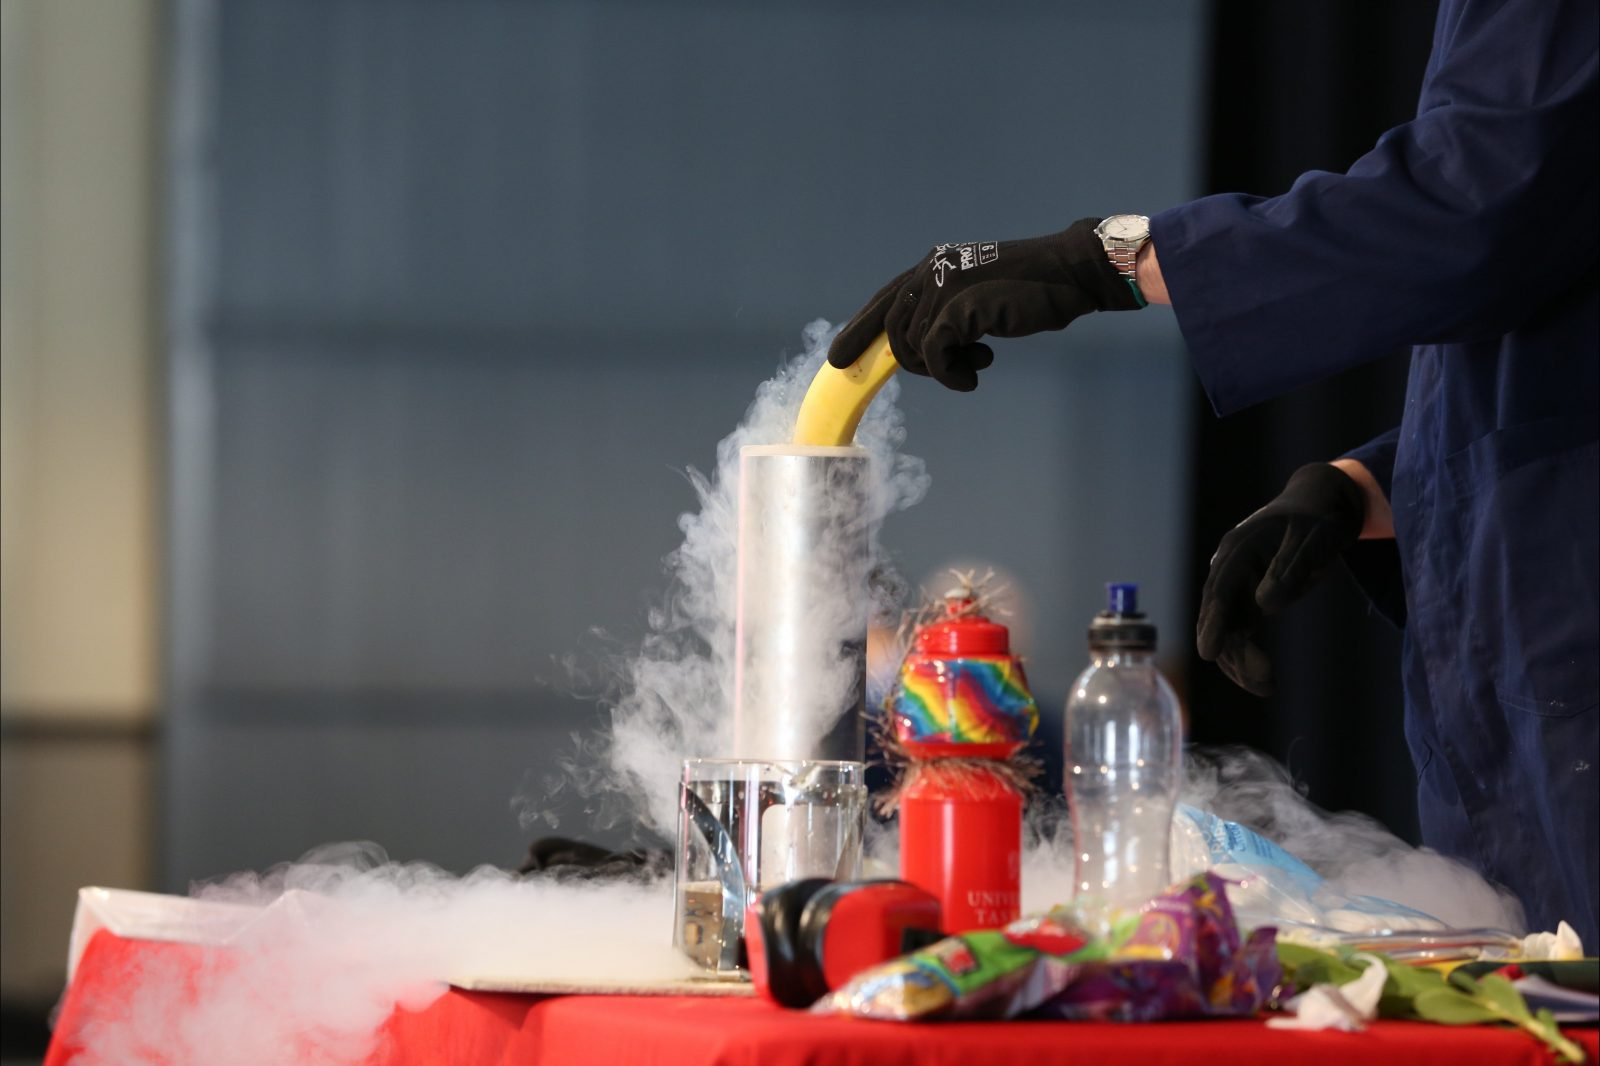 A man dipping a banana into liquid nitrogen.